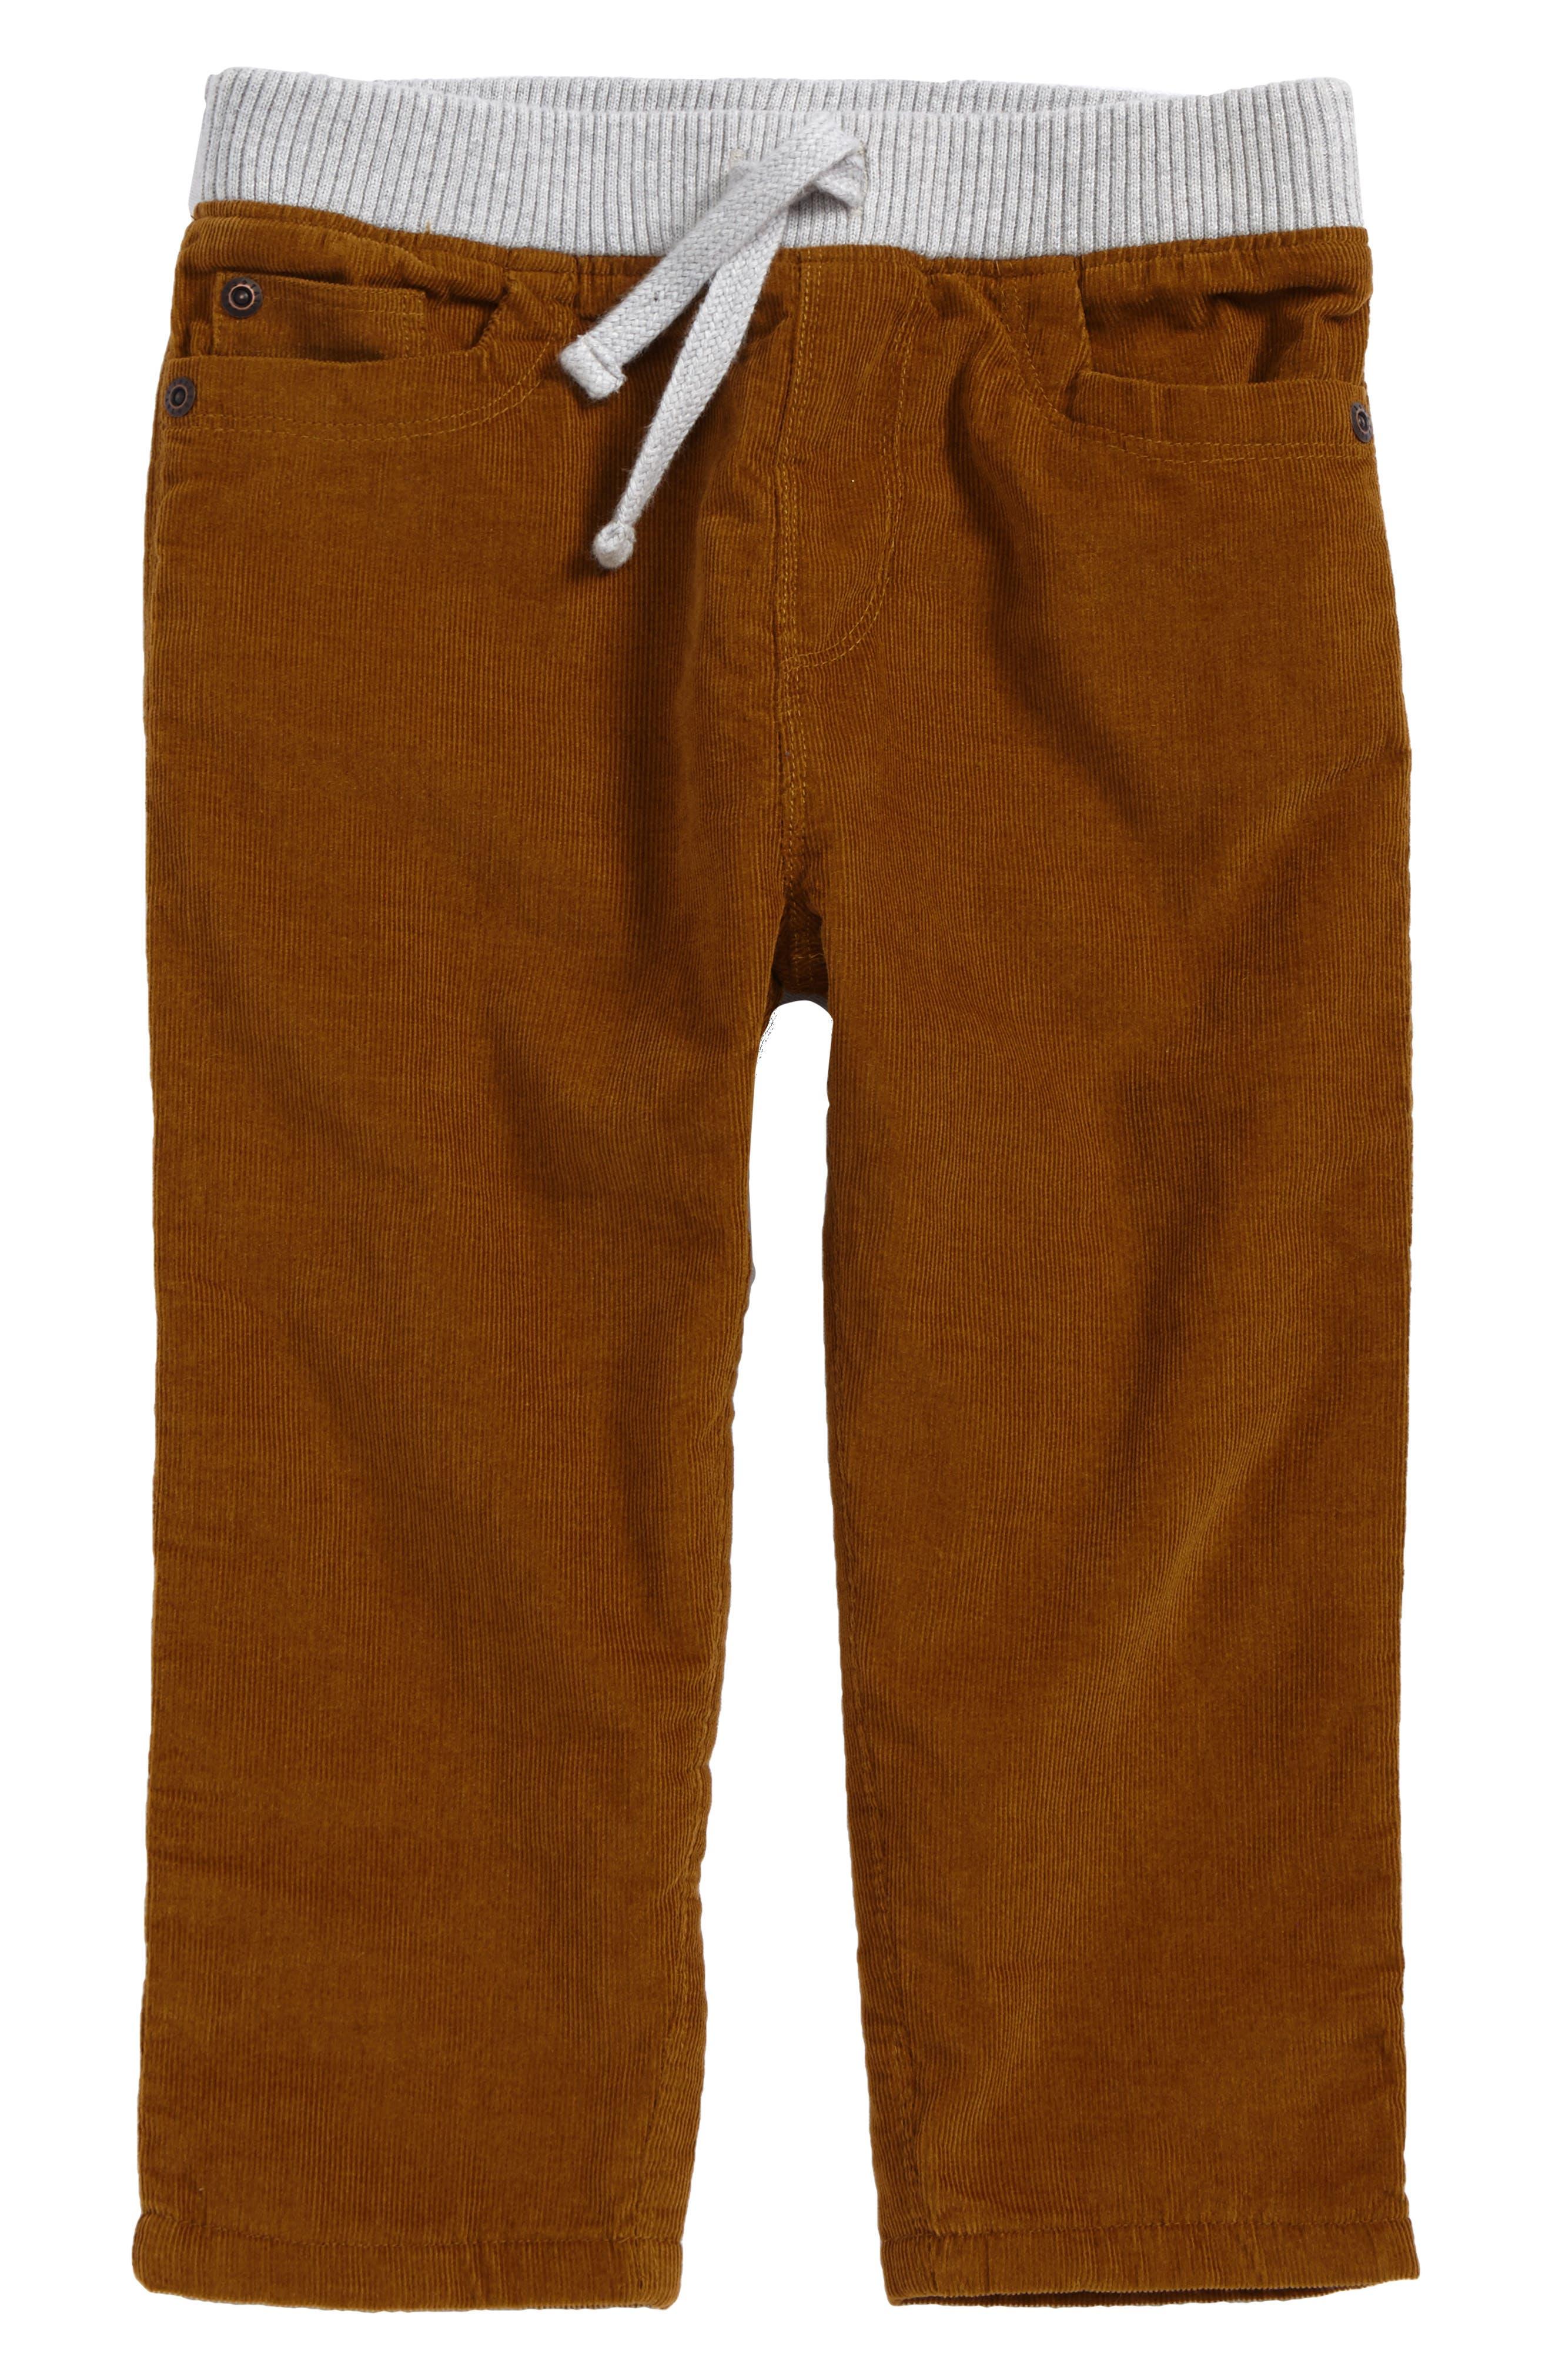 Alternate Image 1 Selected - Tucker + Tate Corduroy Pants (Baby Boys)